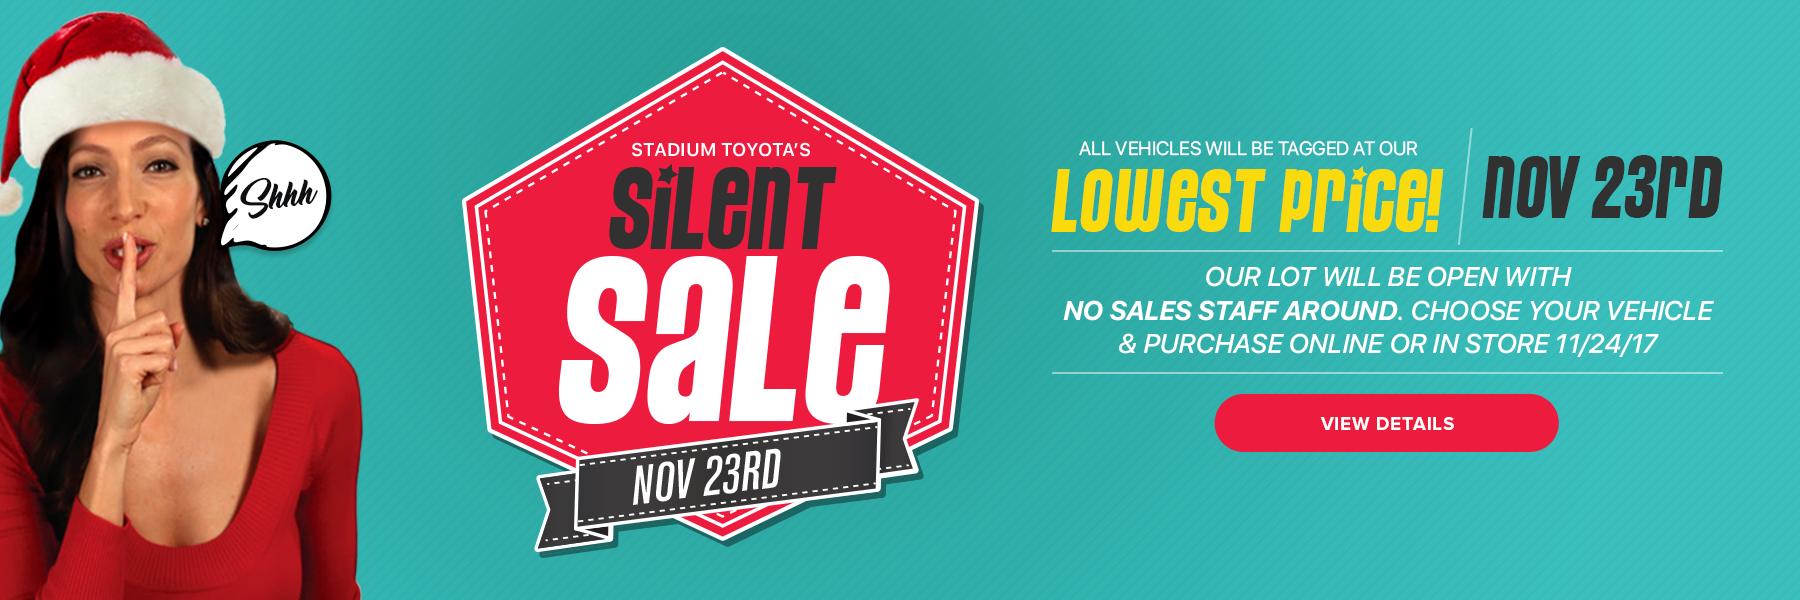 Stadium Toyota Silent Sale